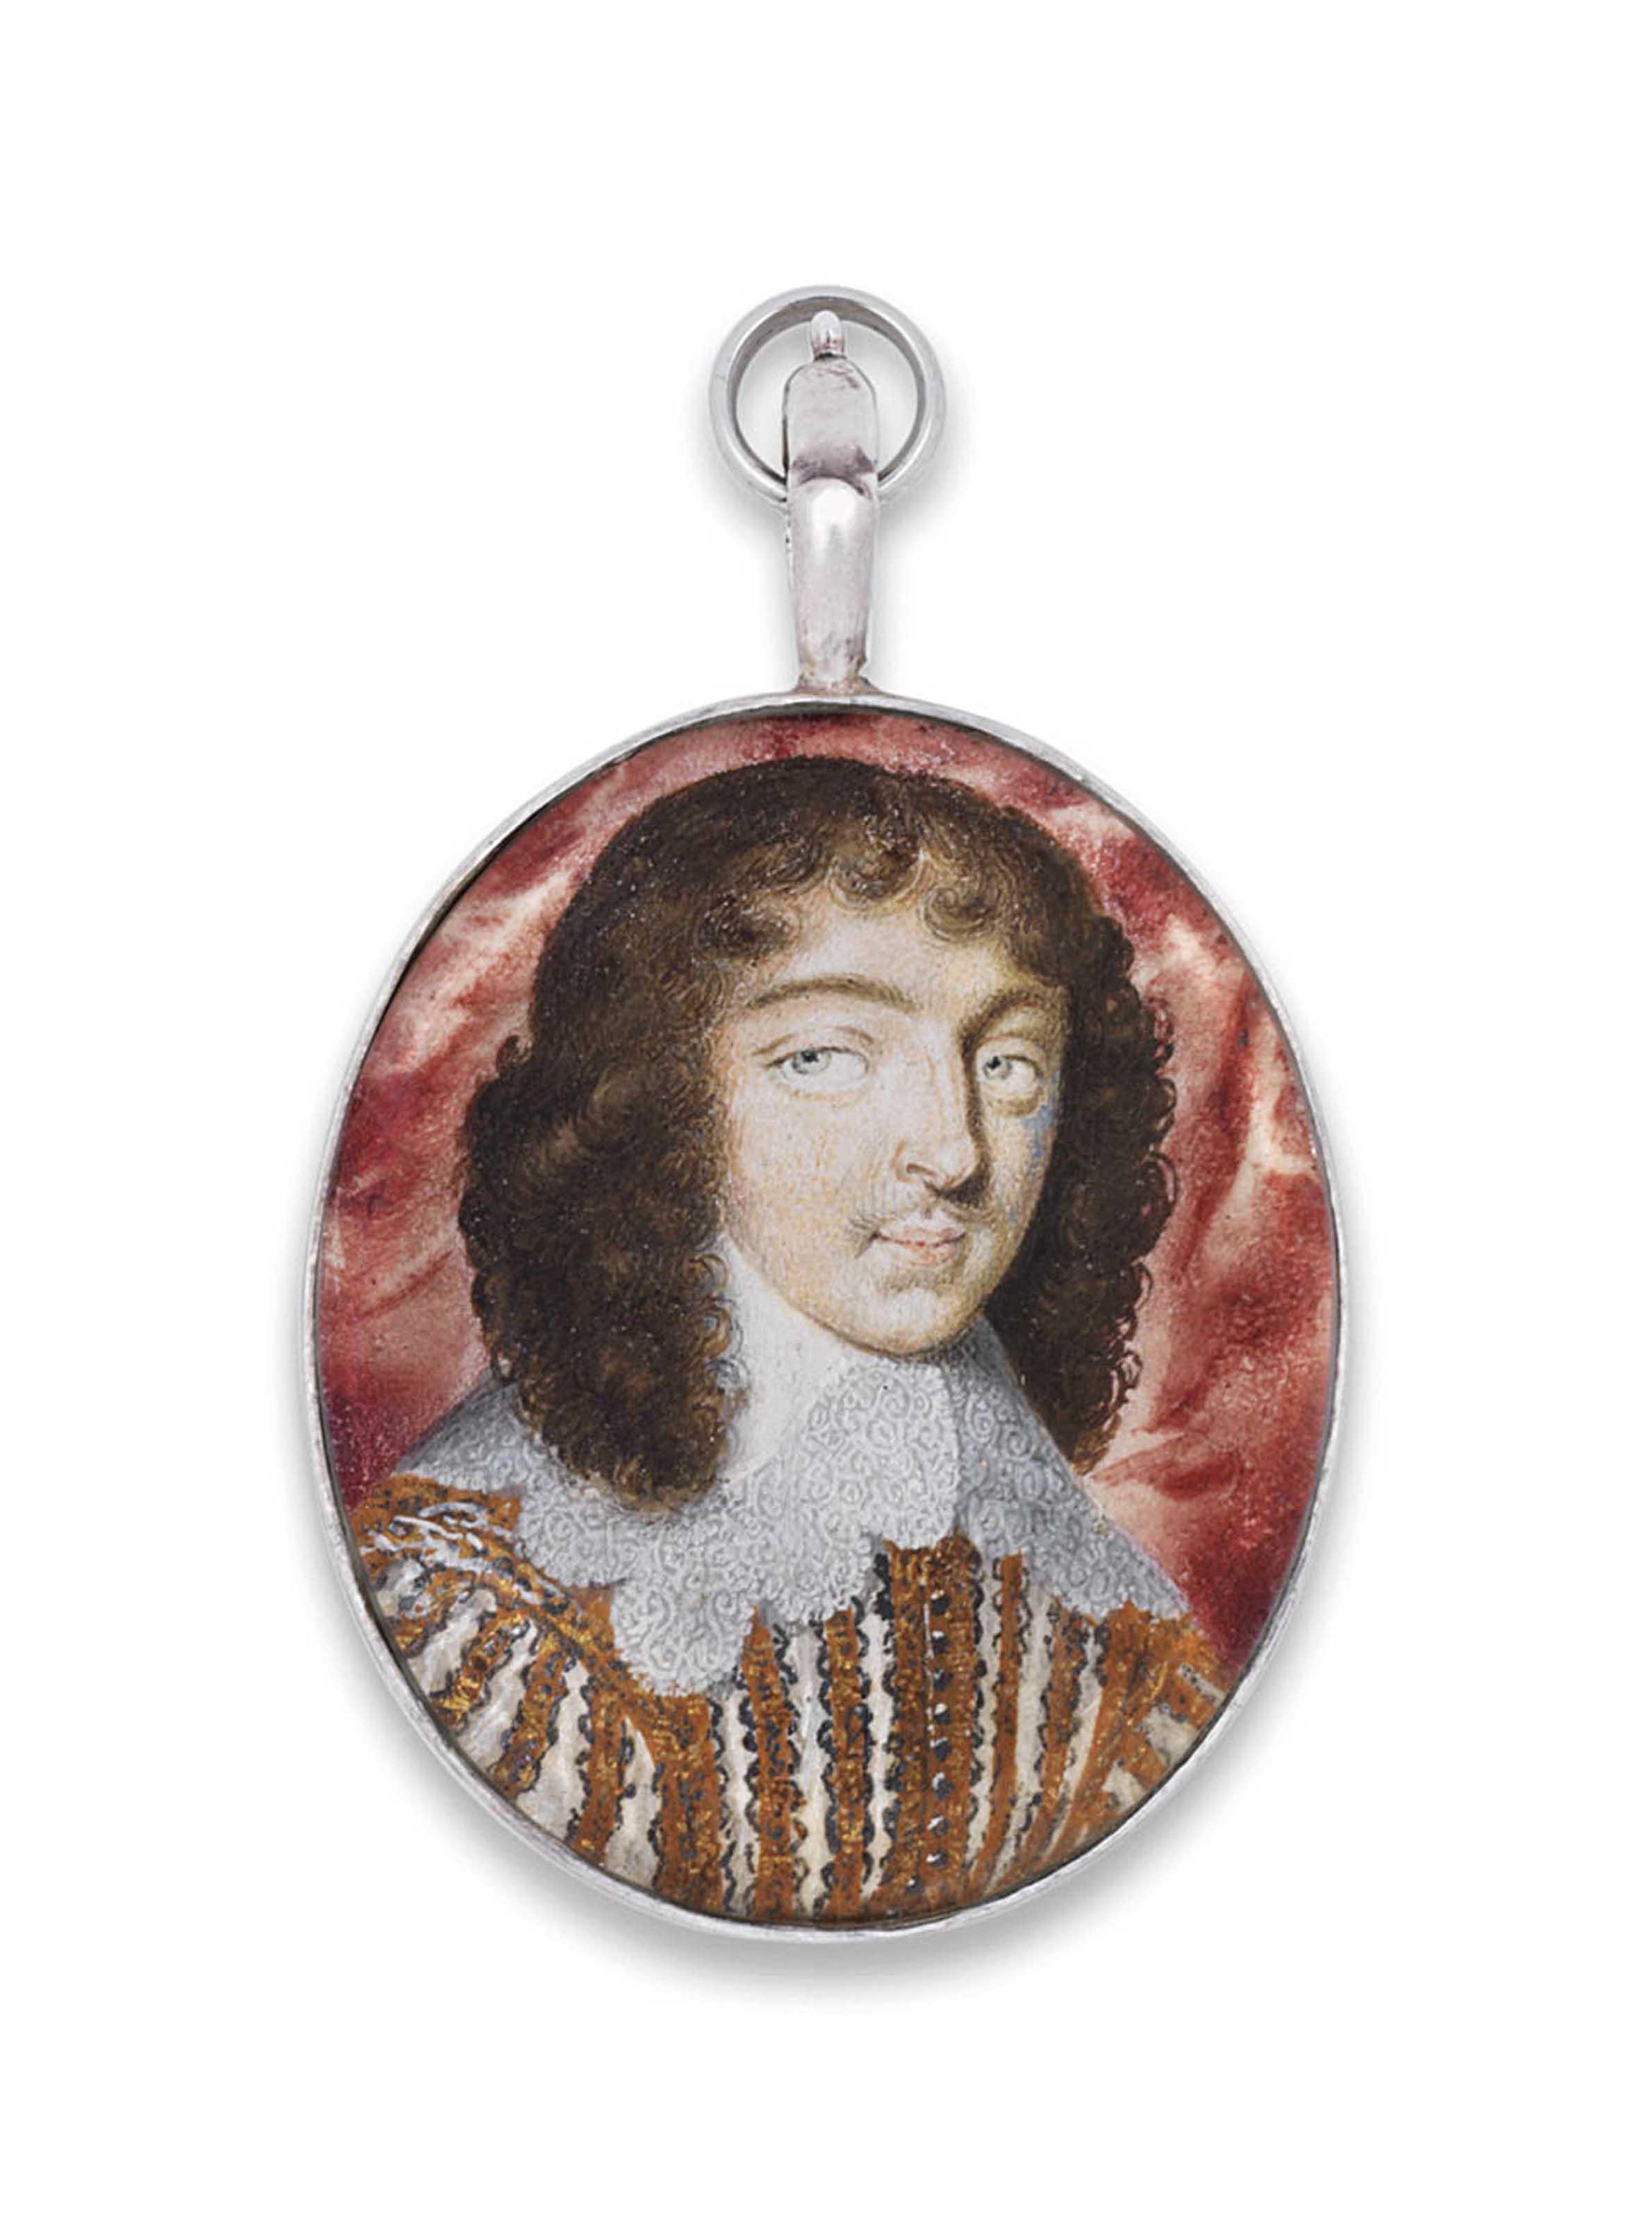 A gentleman called Monsigneur de Pesi; red curtain background